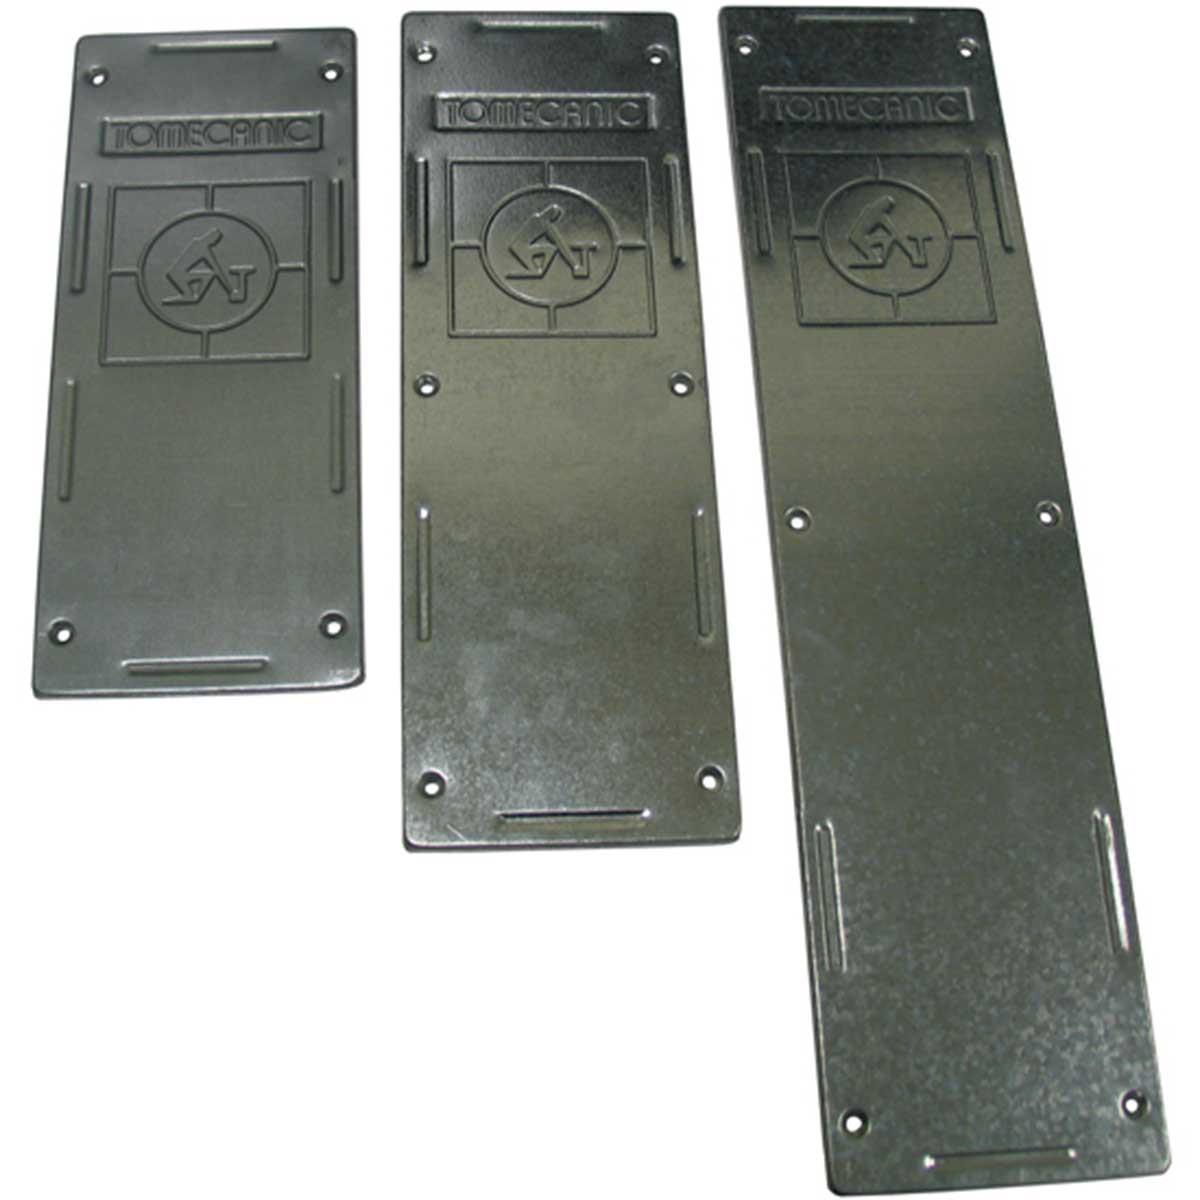 Platform Set Tomecanic Supercut